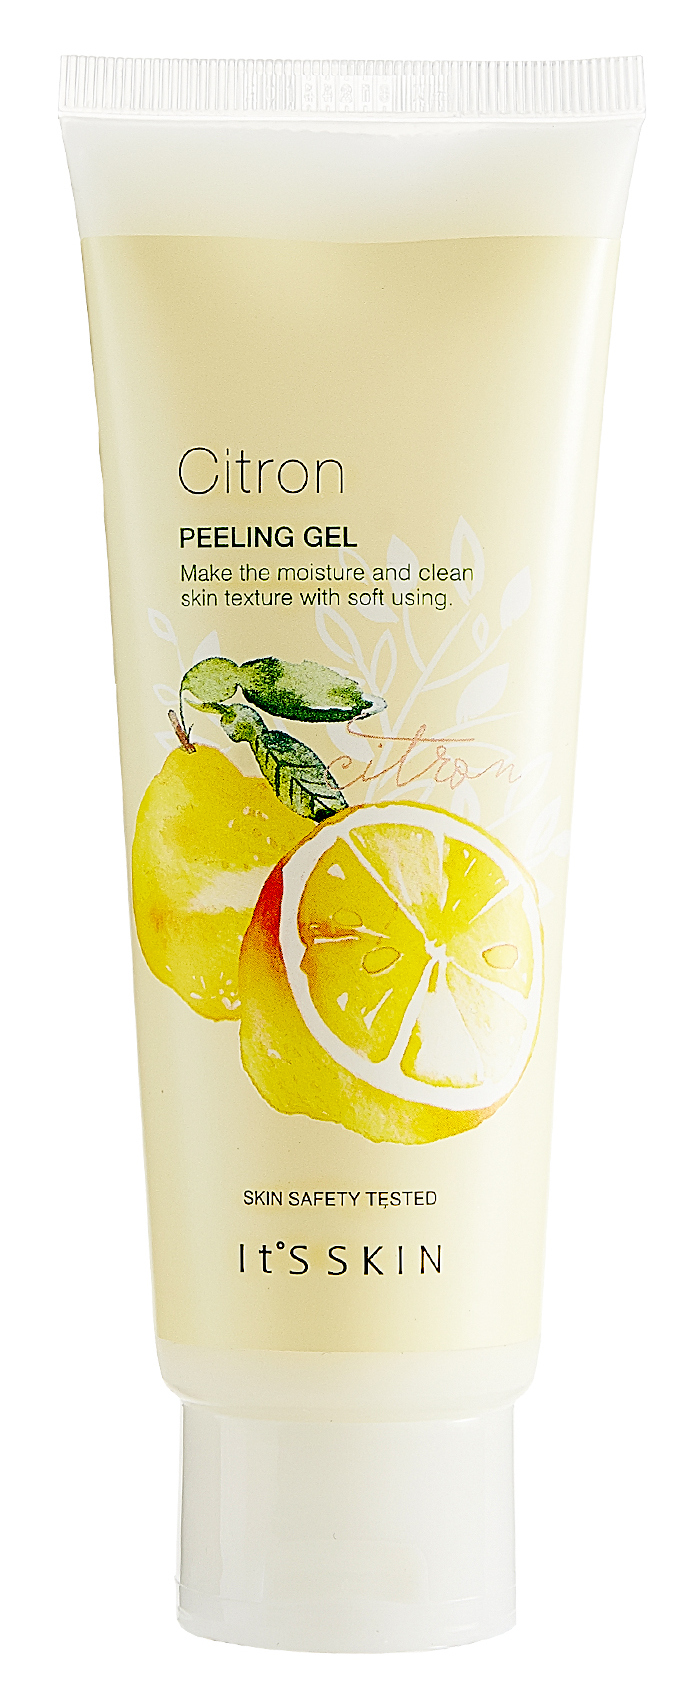 It'S SKIN Пилинг-гель с экстрактом цитрона / Citron Cleansing Peeling 120 мл